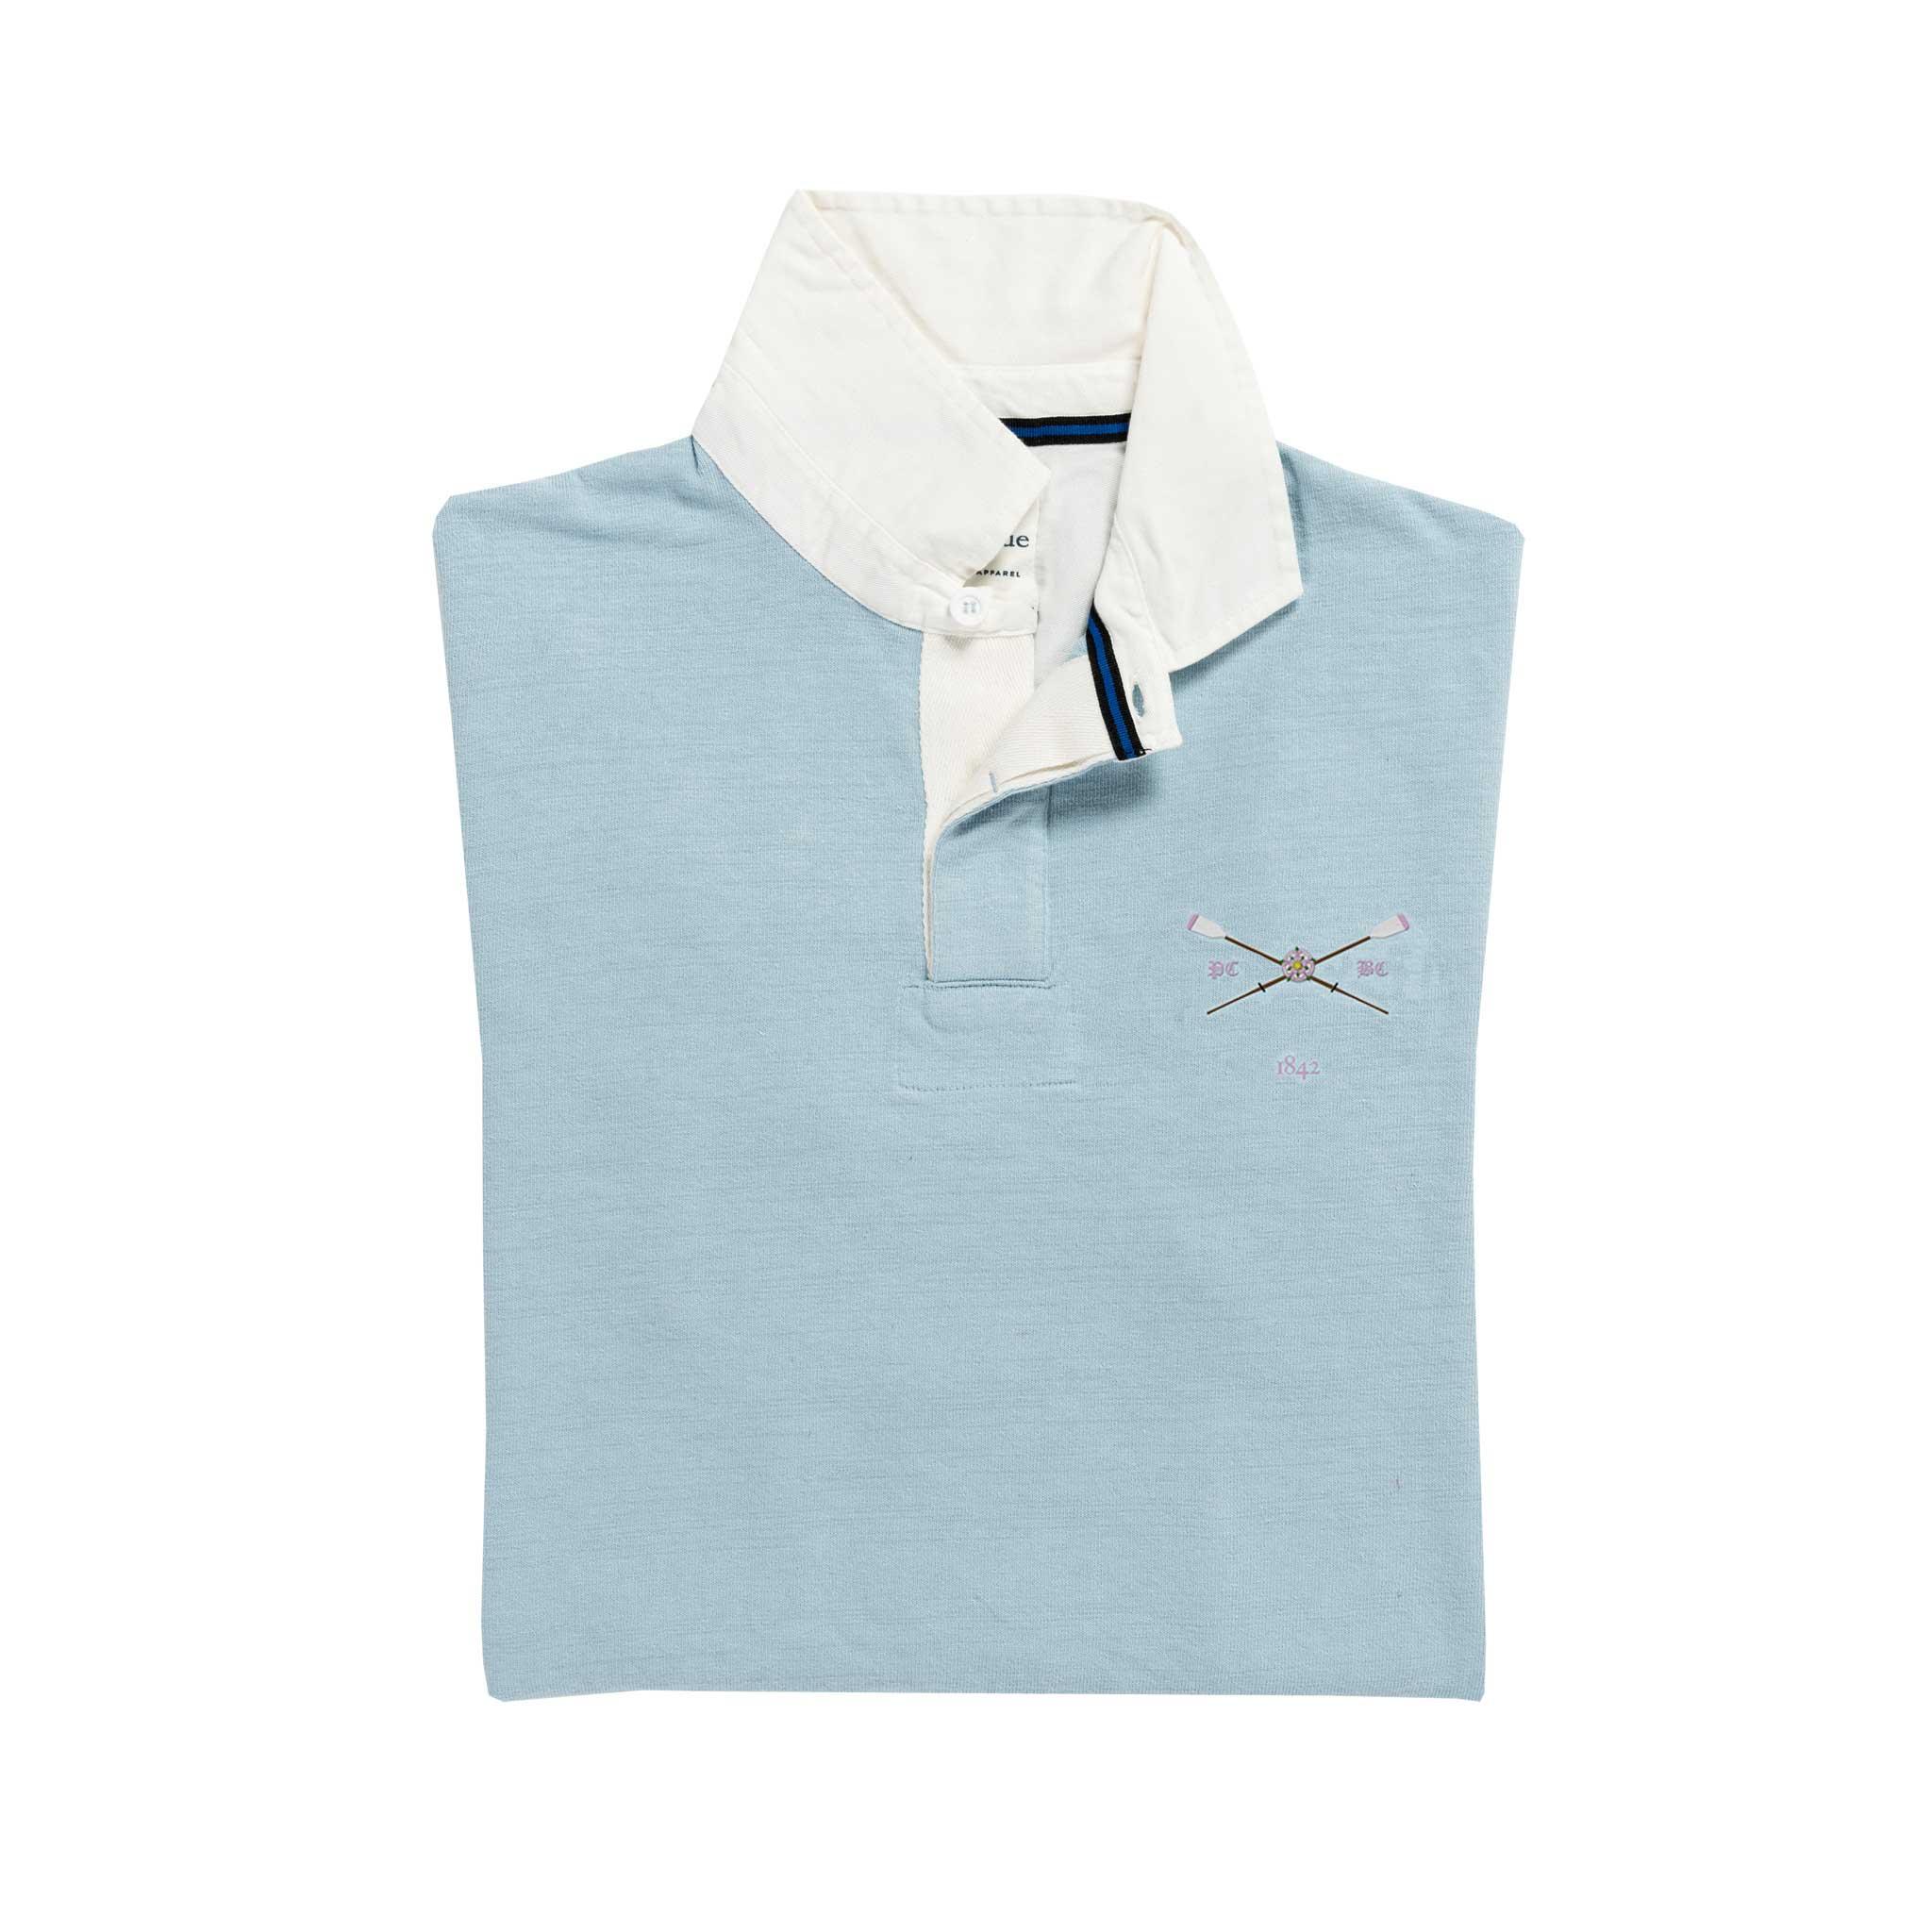 Pembroke 1842 Rugby Shirt_Folded